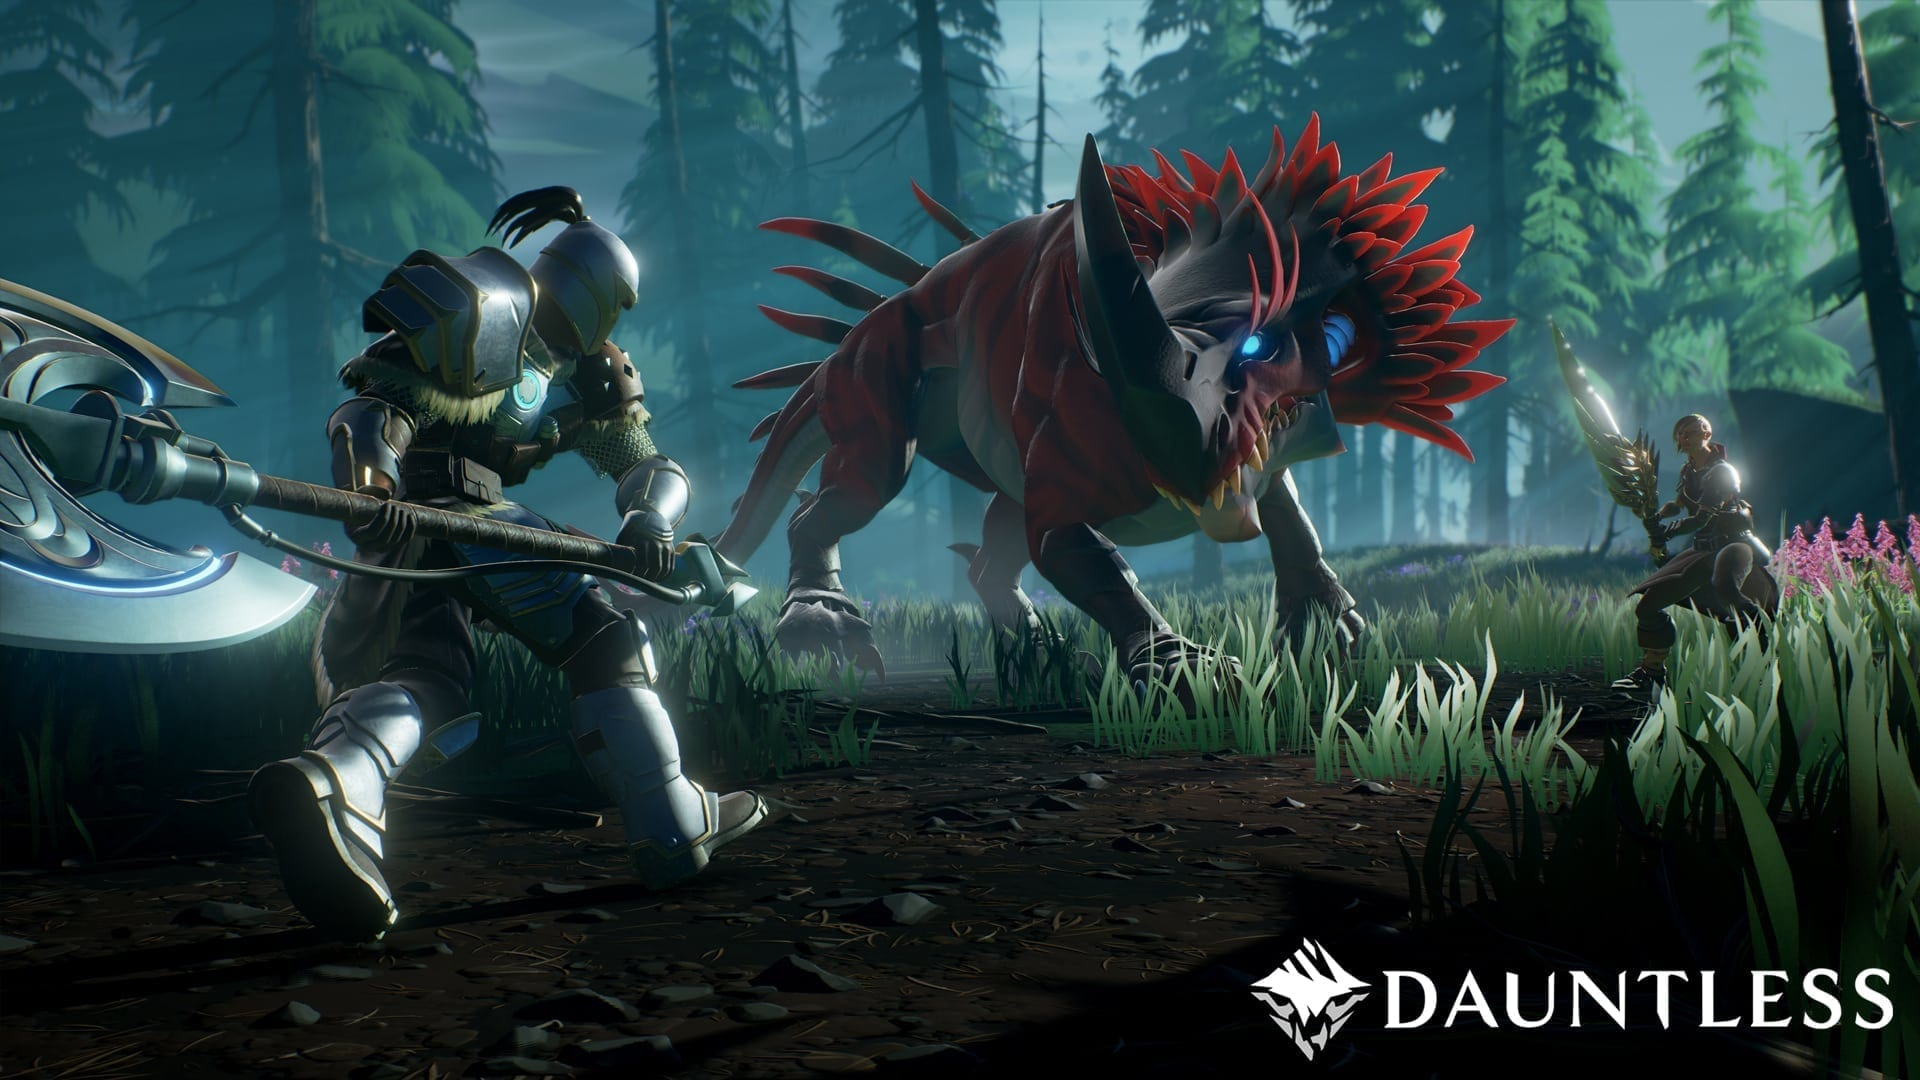 dauntless-game-screenshot-1